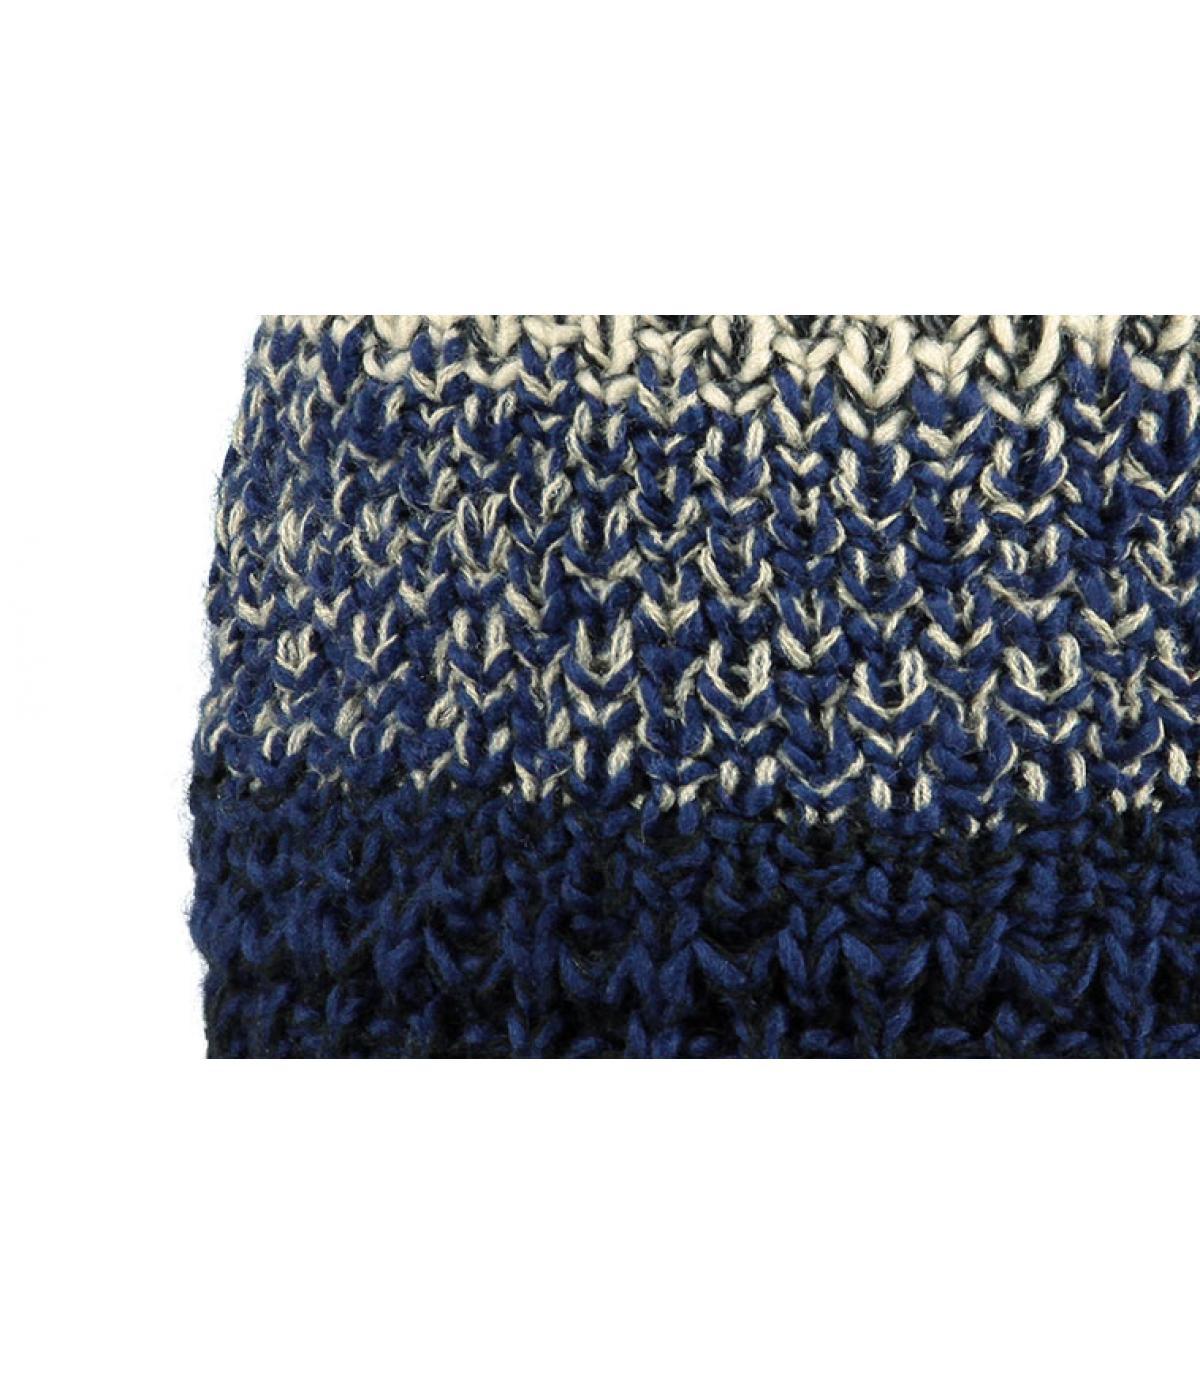 Blue pom beanie for men - Lester beanie dark blue by Barts. c2f8021e7cd